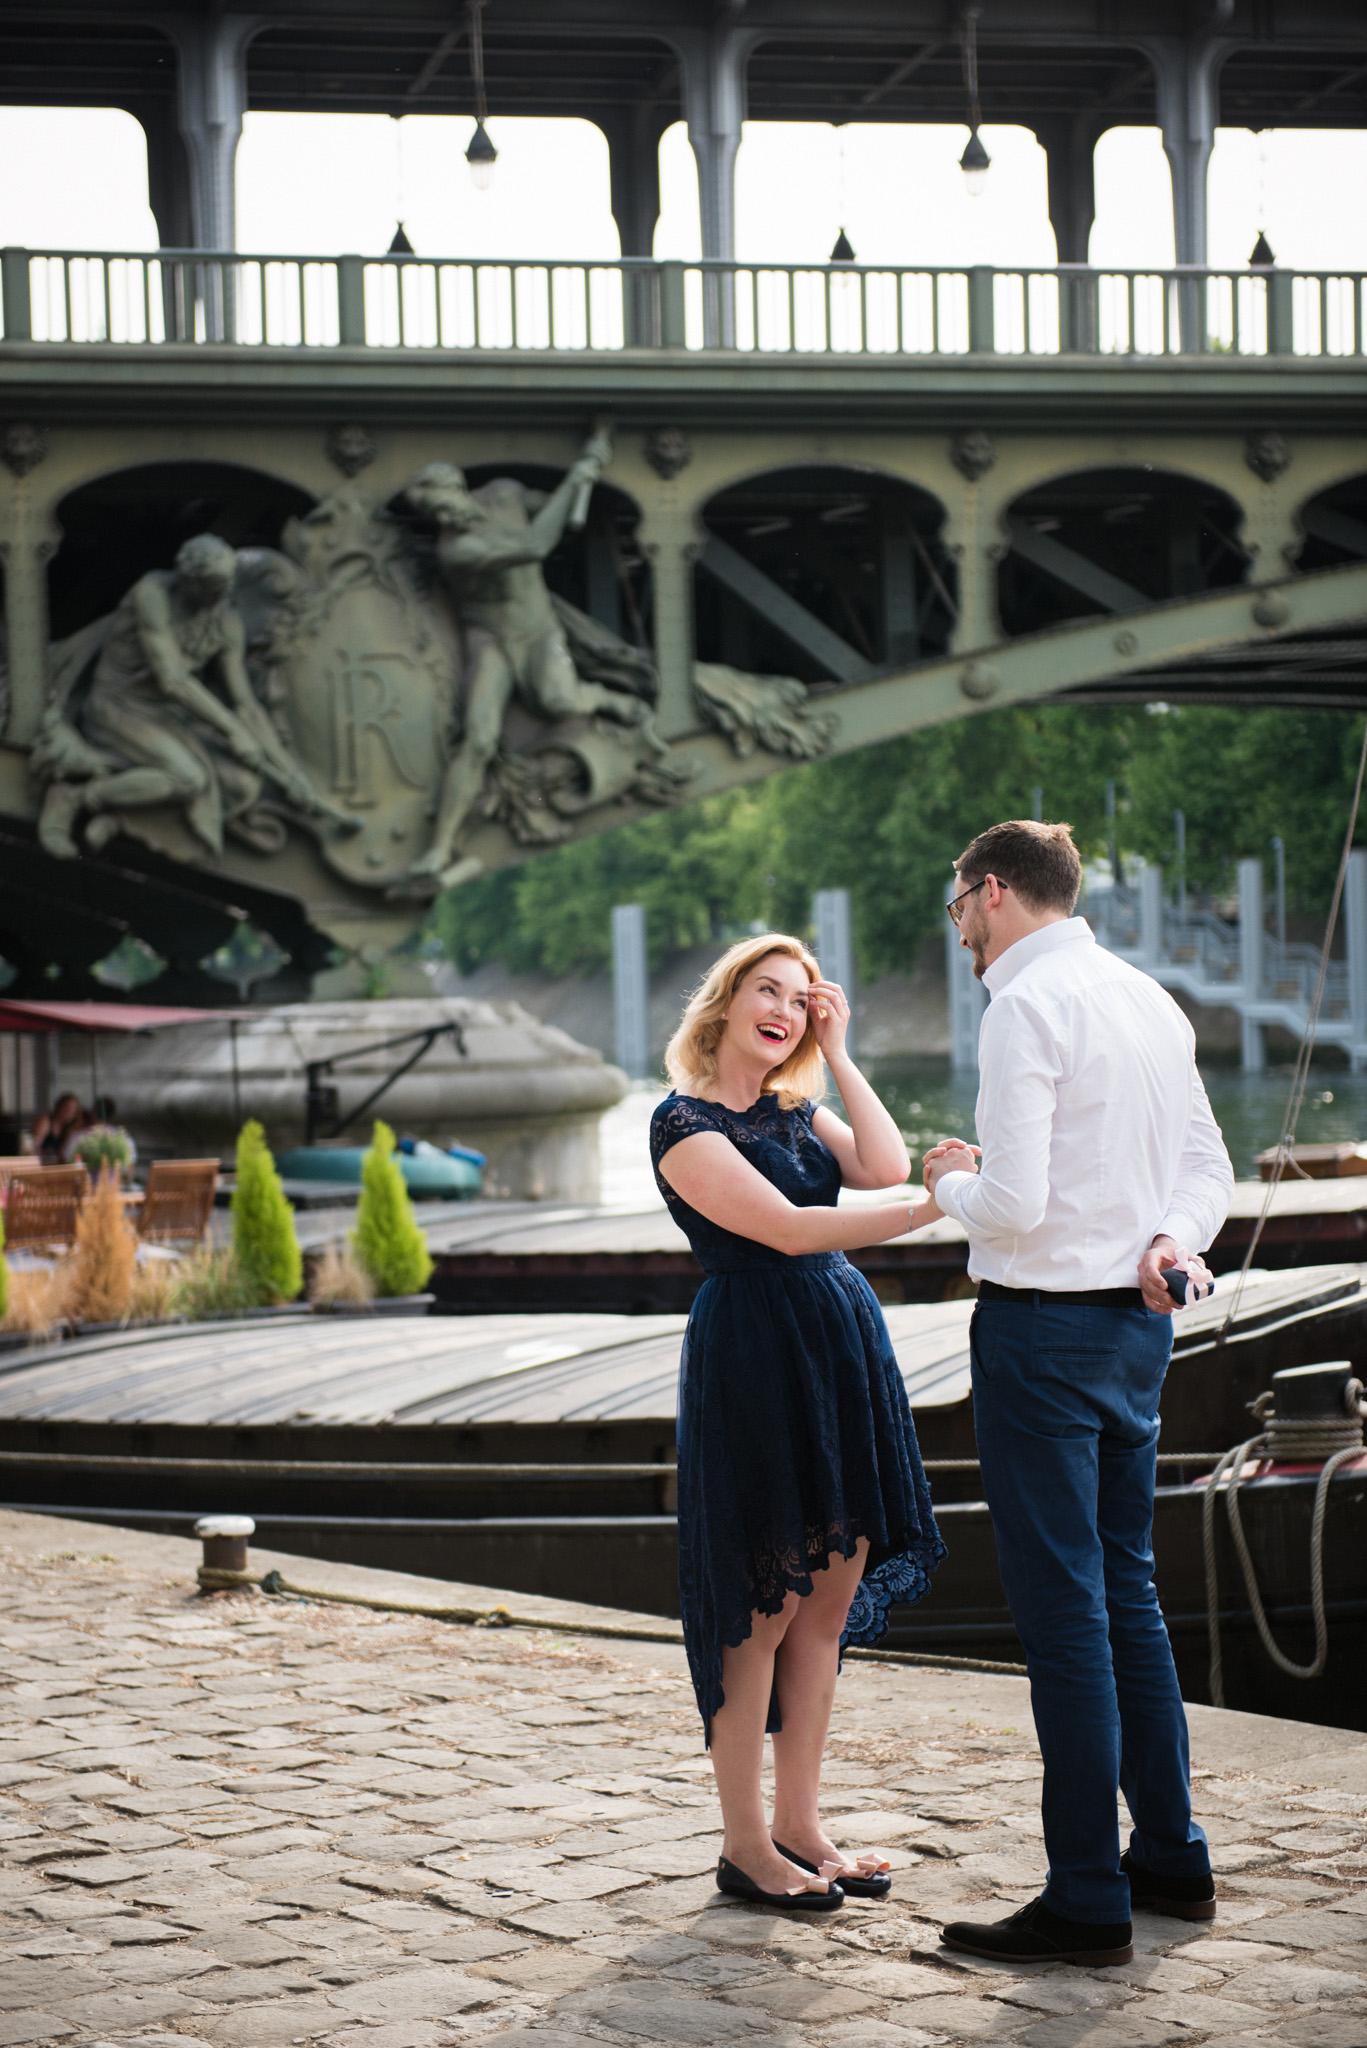 Surprise Proposal in Paris.jpg